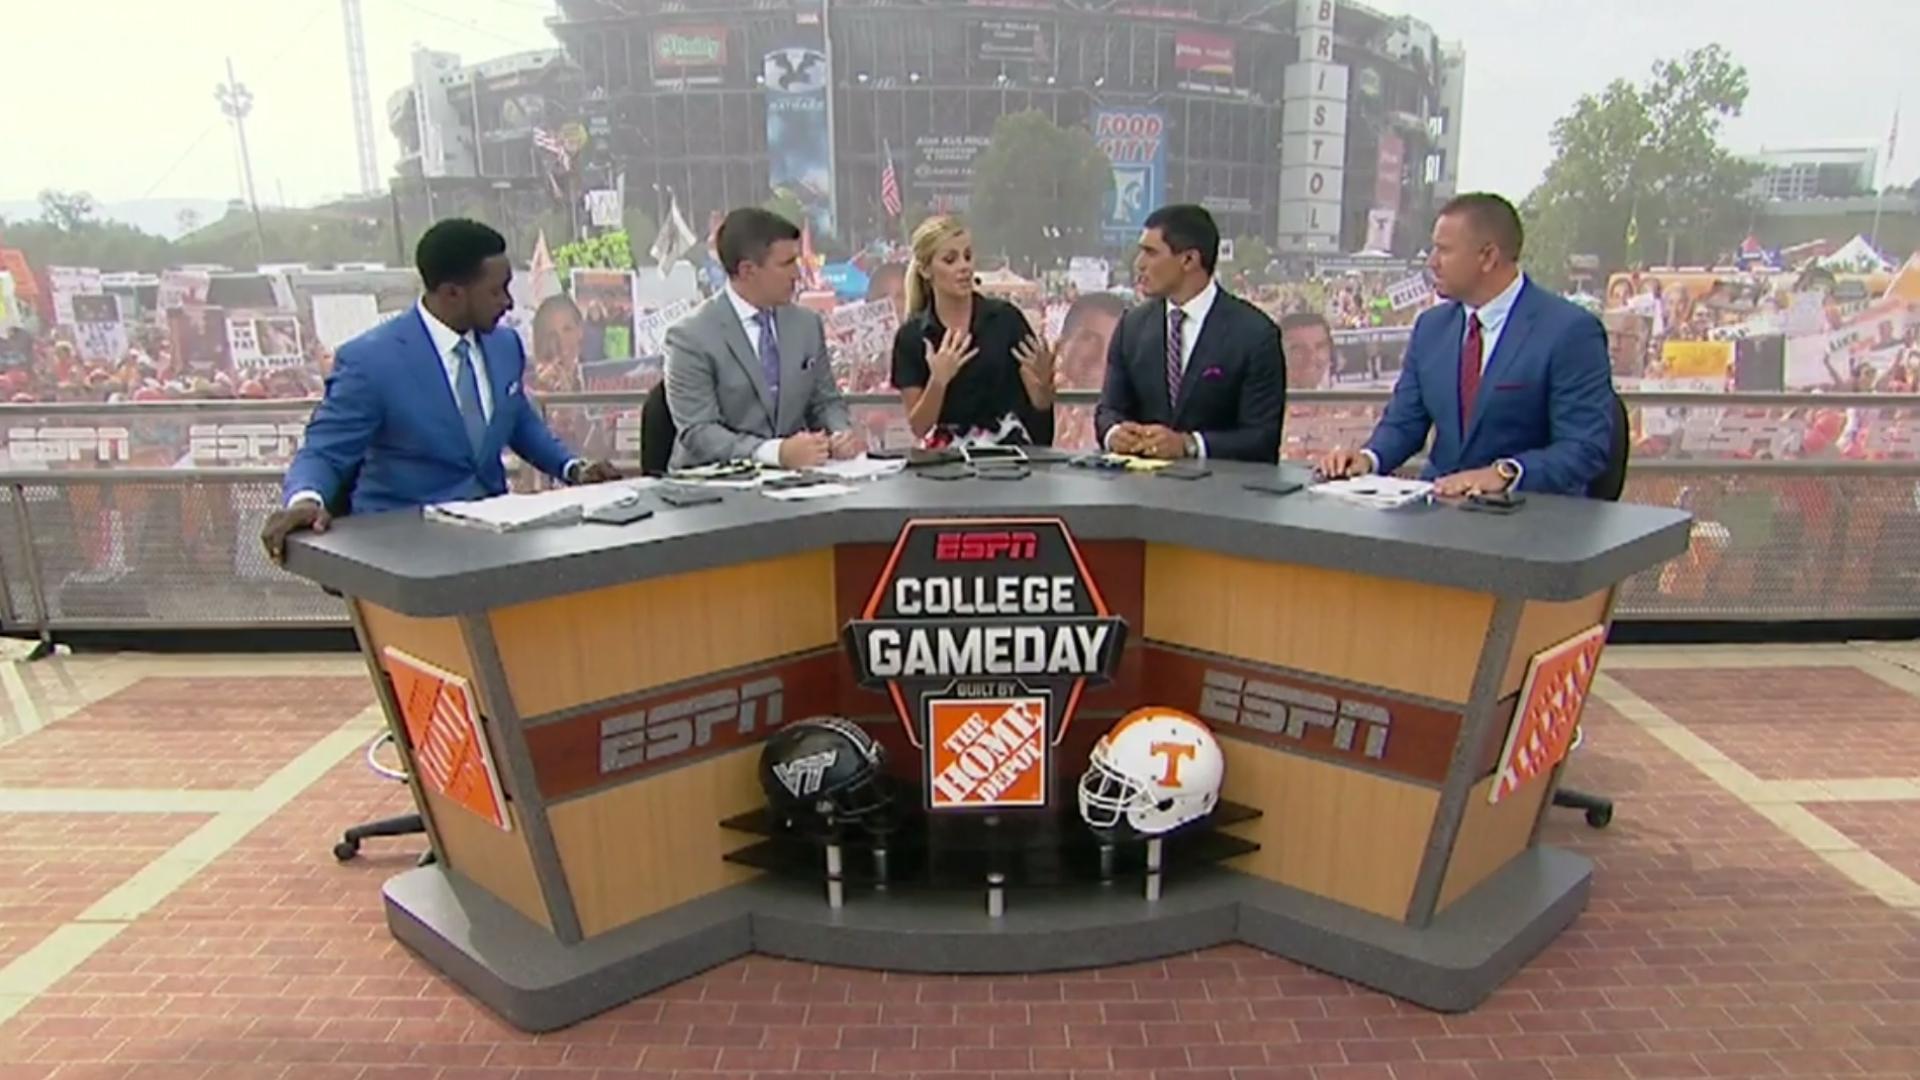 college gameday espn ncaa football bracket